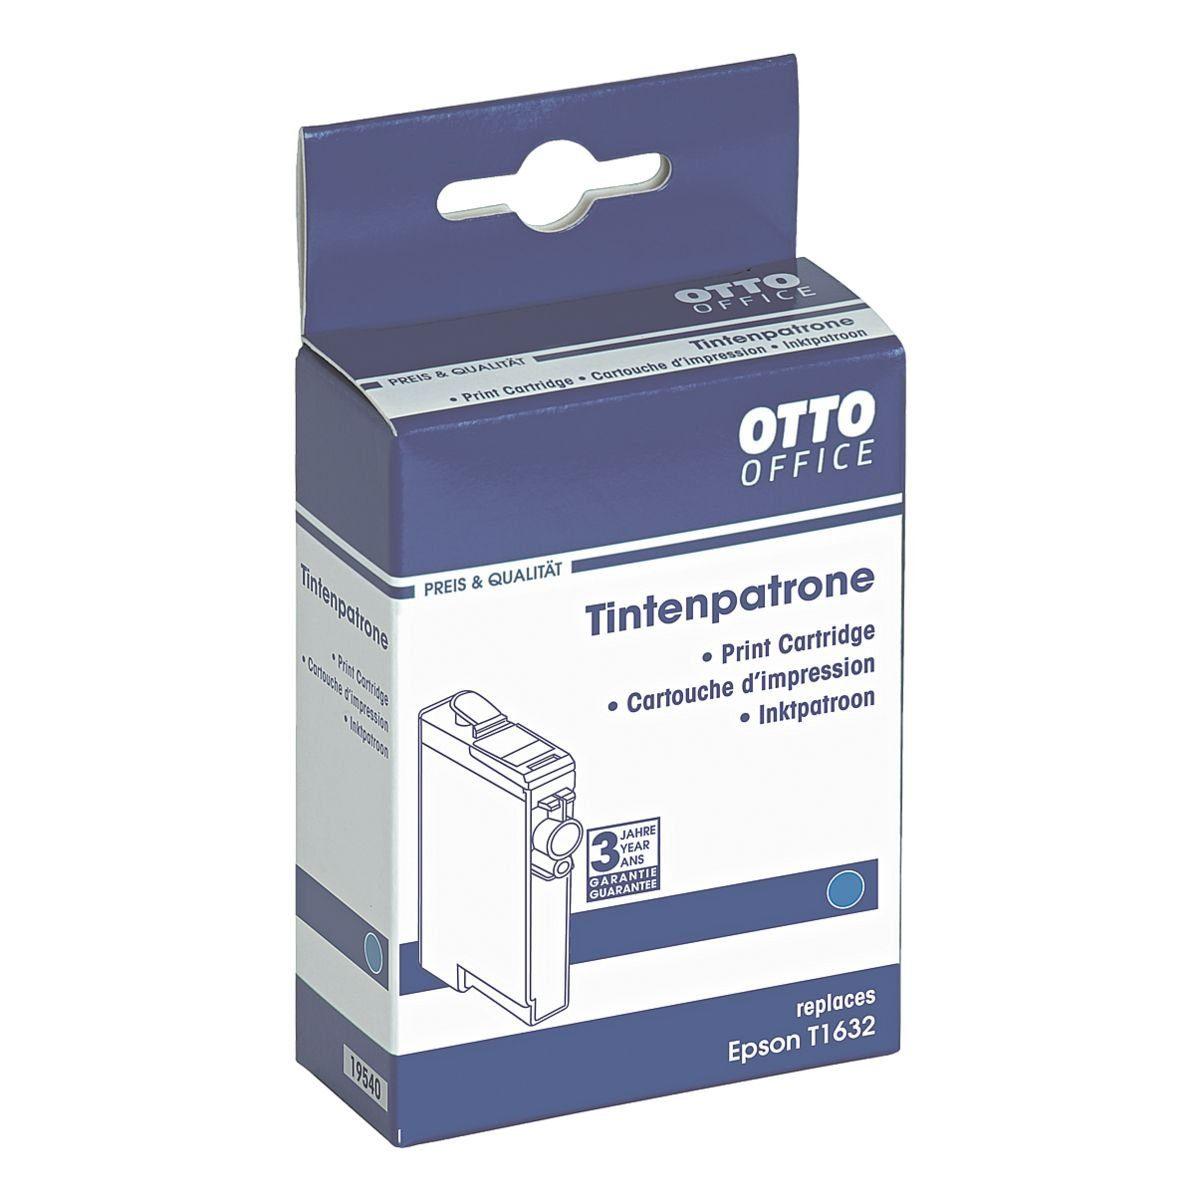 OTTO Office Standard Tintenpatrone ersetzt Epson »T1632XL«